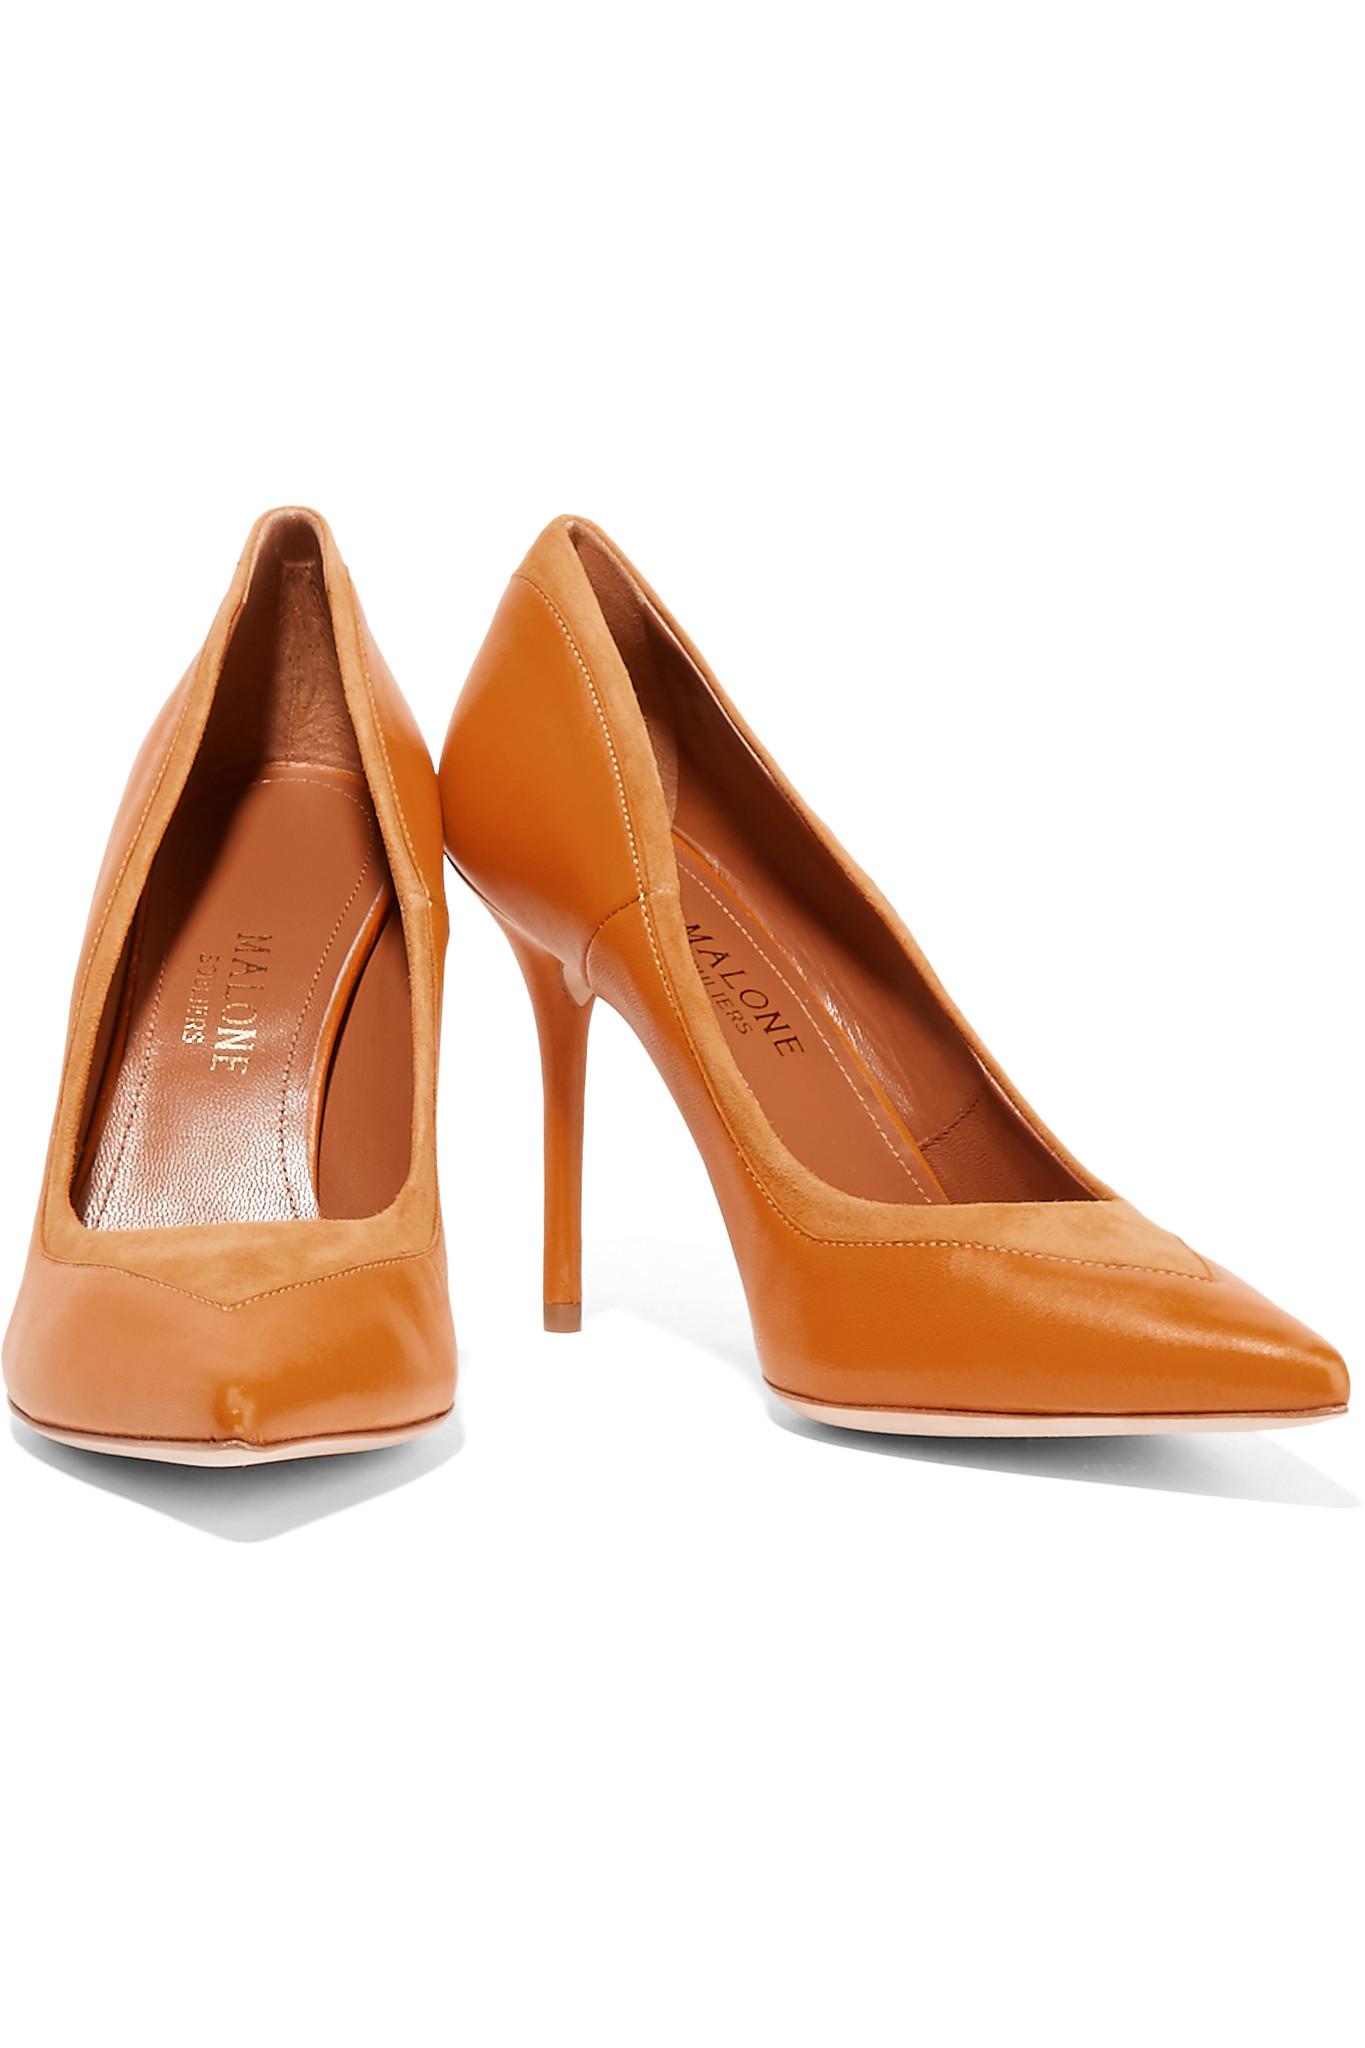 Bettye Muller Shoe Sizing